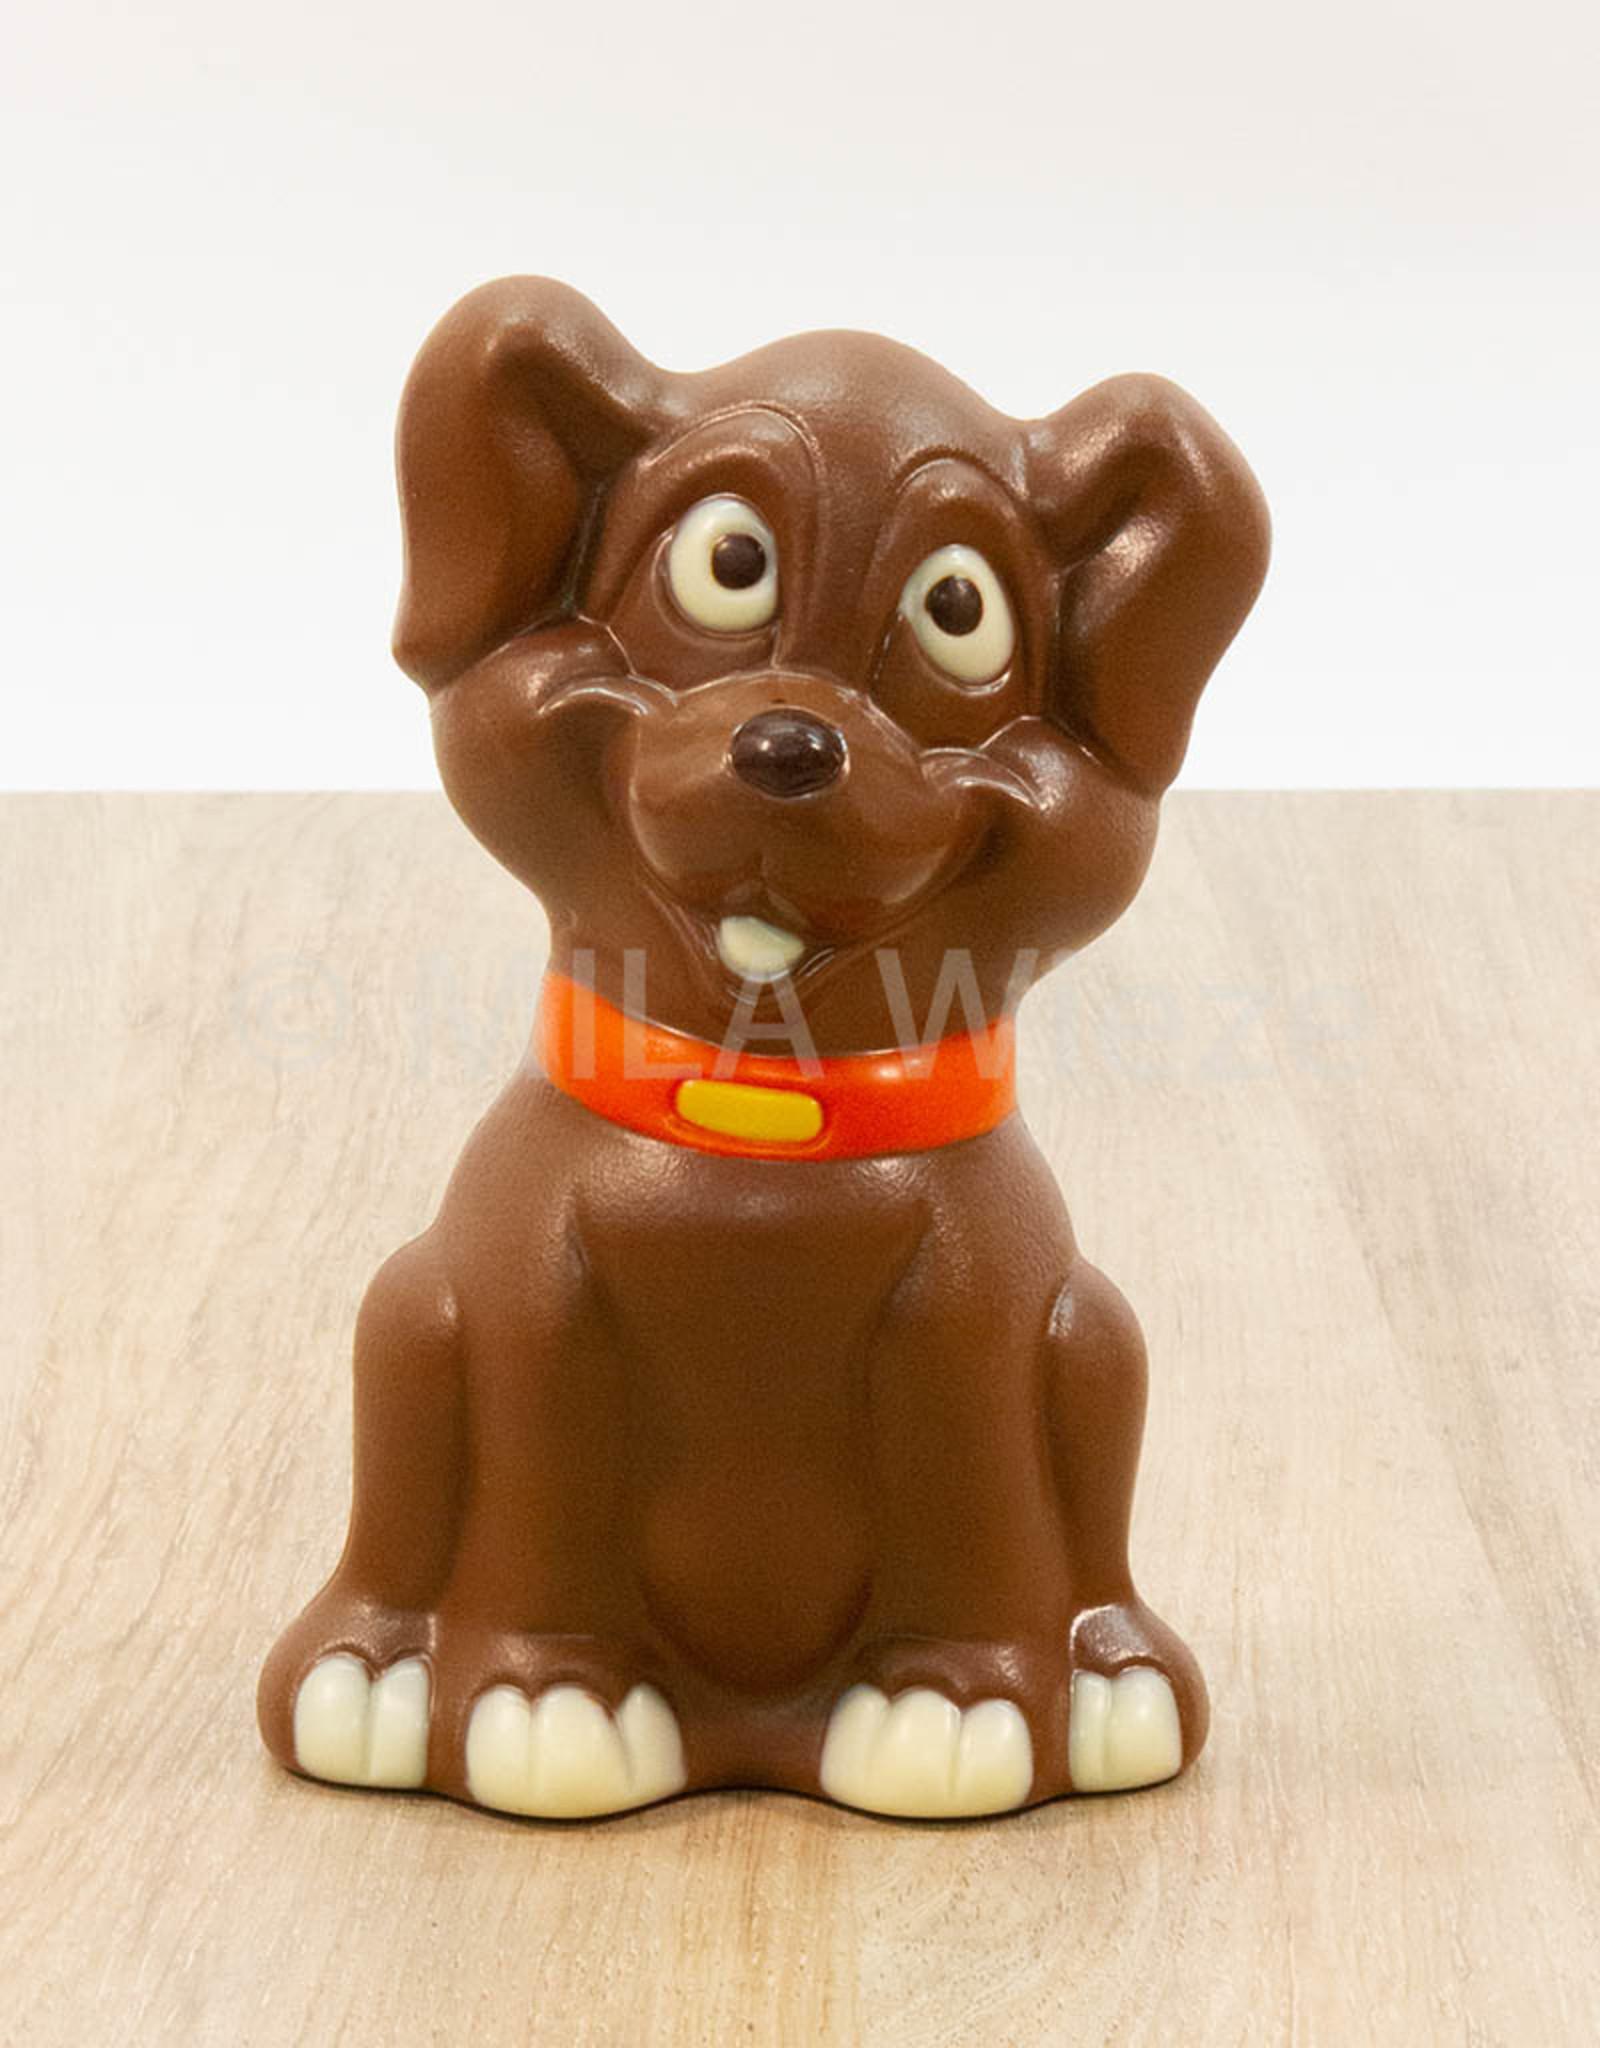 Disney hond deco - 150 gr - melkchocolade